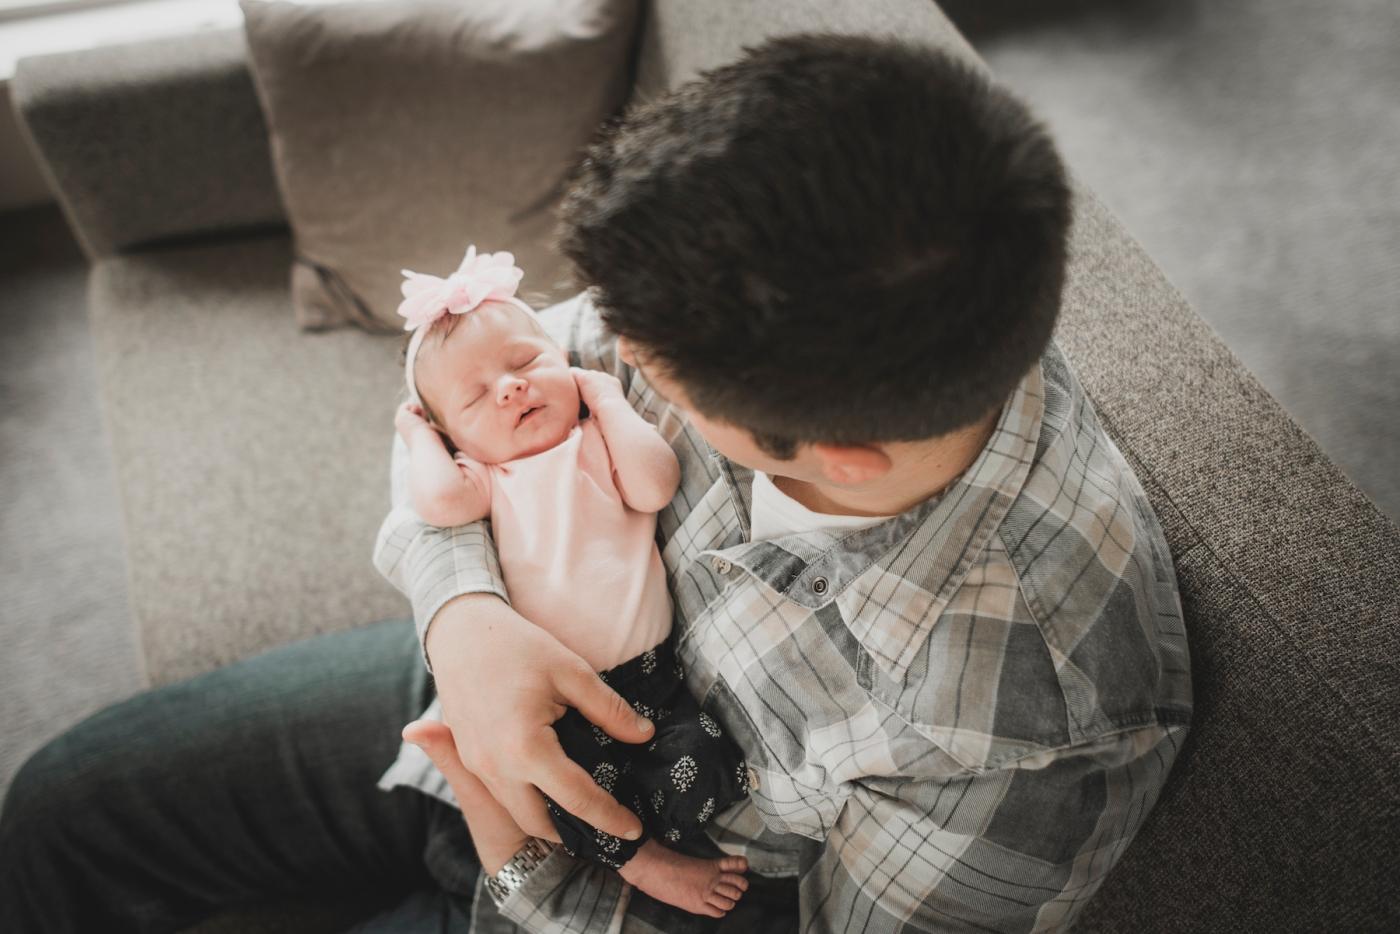 janes_photography_2016_renton_newborn_session_violetr8382